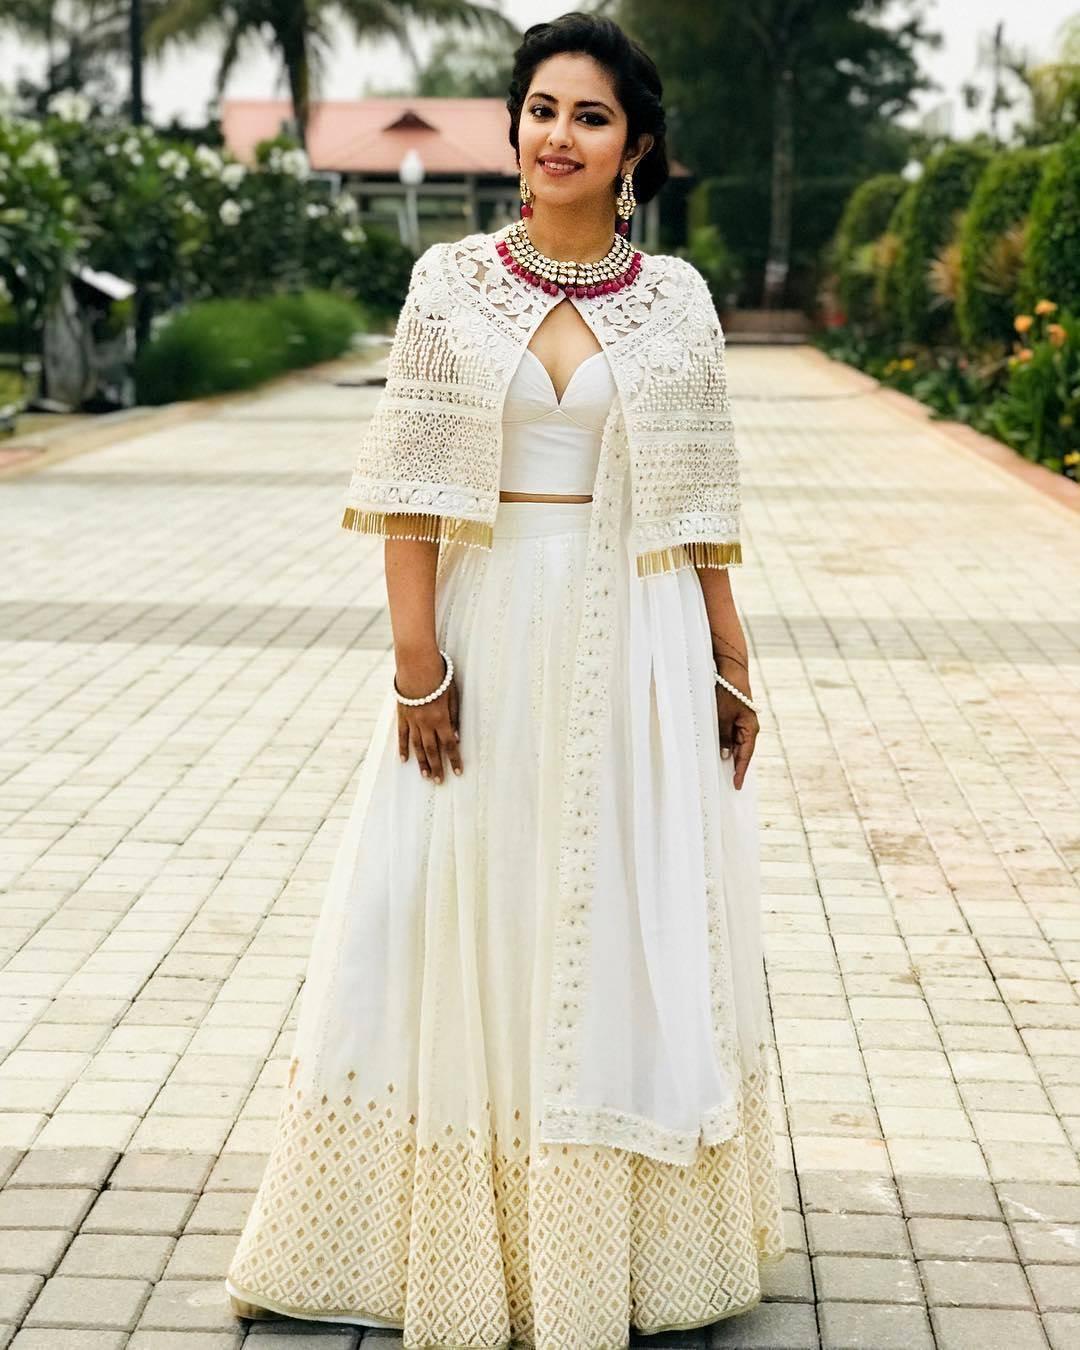 Laado – Veerpur Ki Mardaani: This is how Avika Gor has grown up to become a pretty lass!